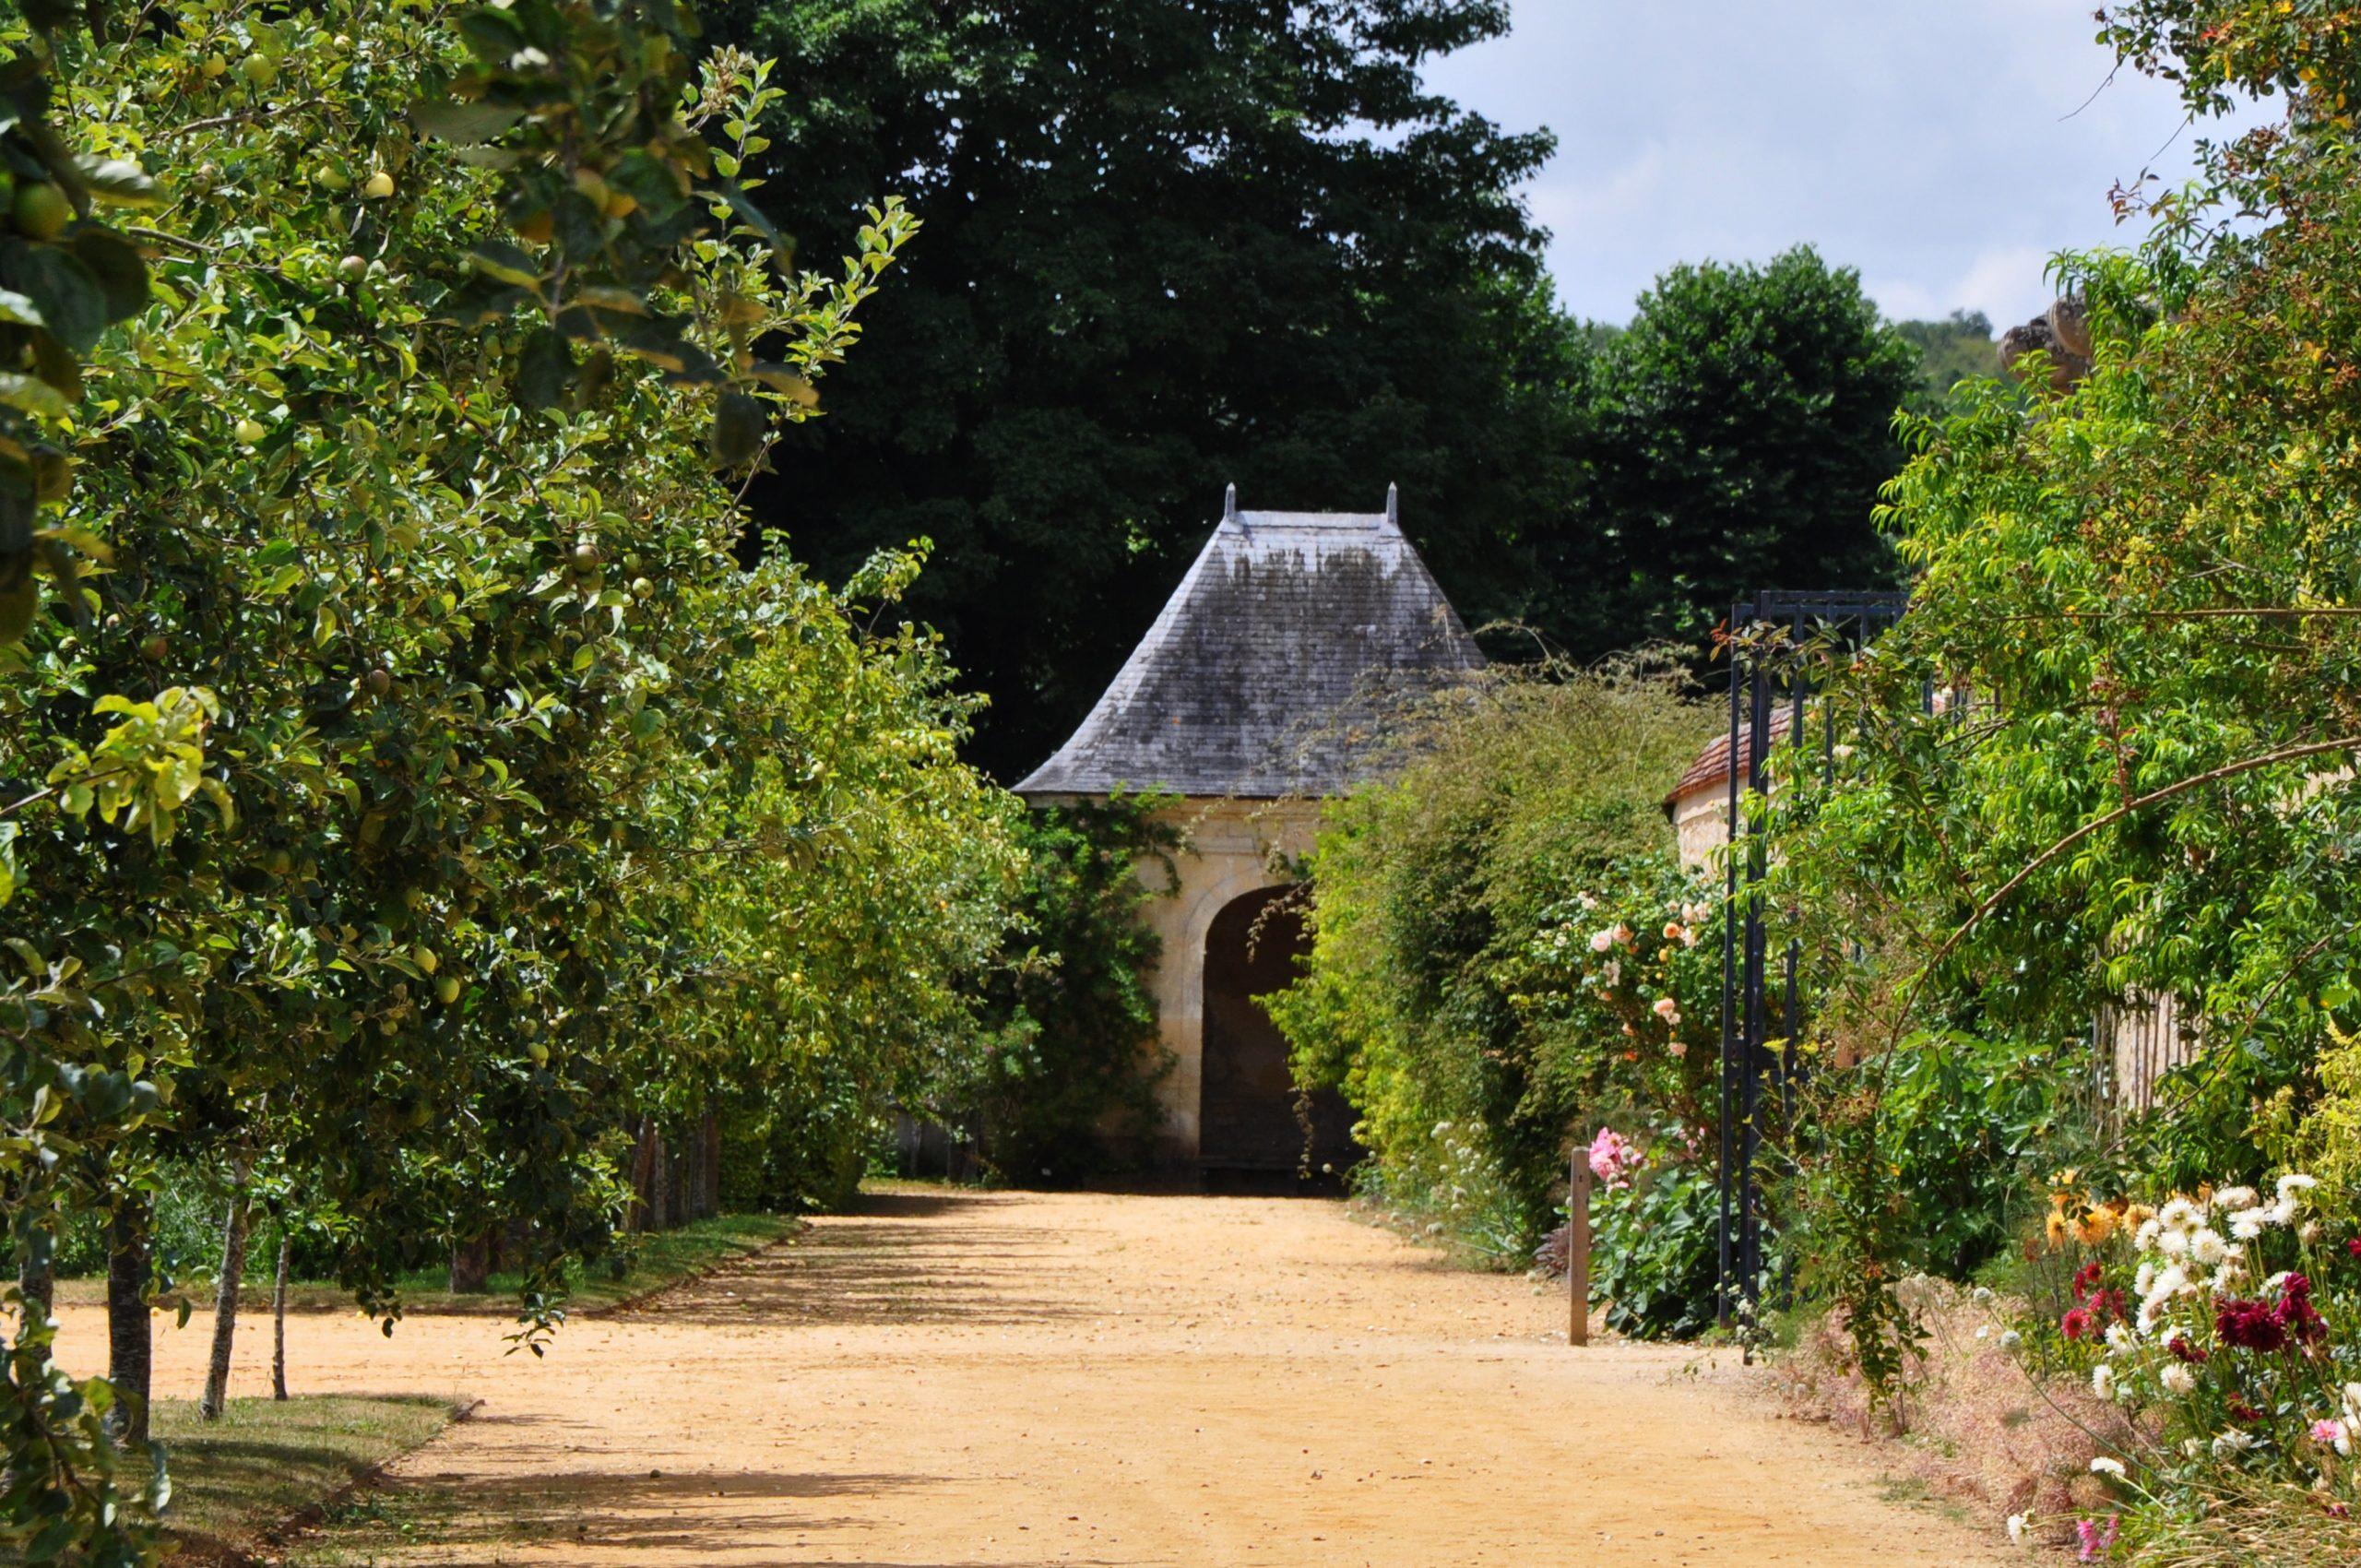 File:abri De Jardin, La Roche-Guyon (France).jpg - Wikimedia ... dedans Abri De Jardin Original